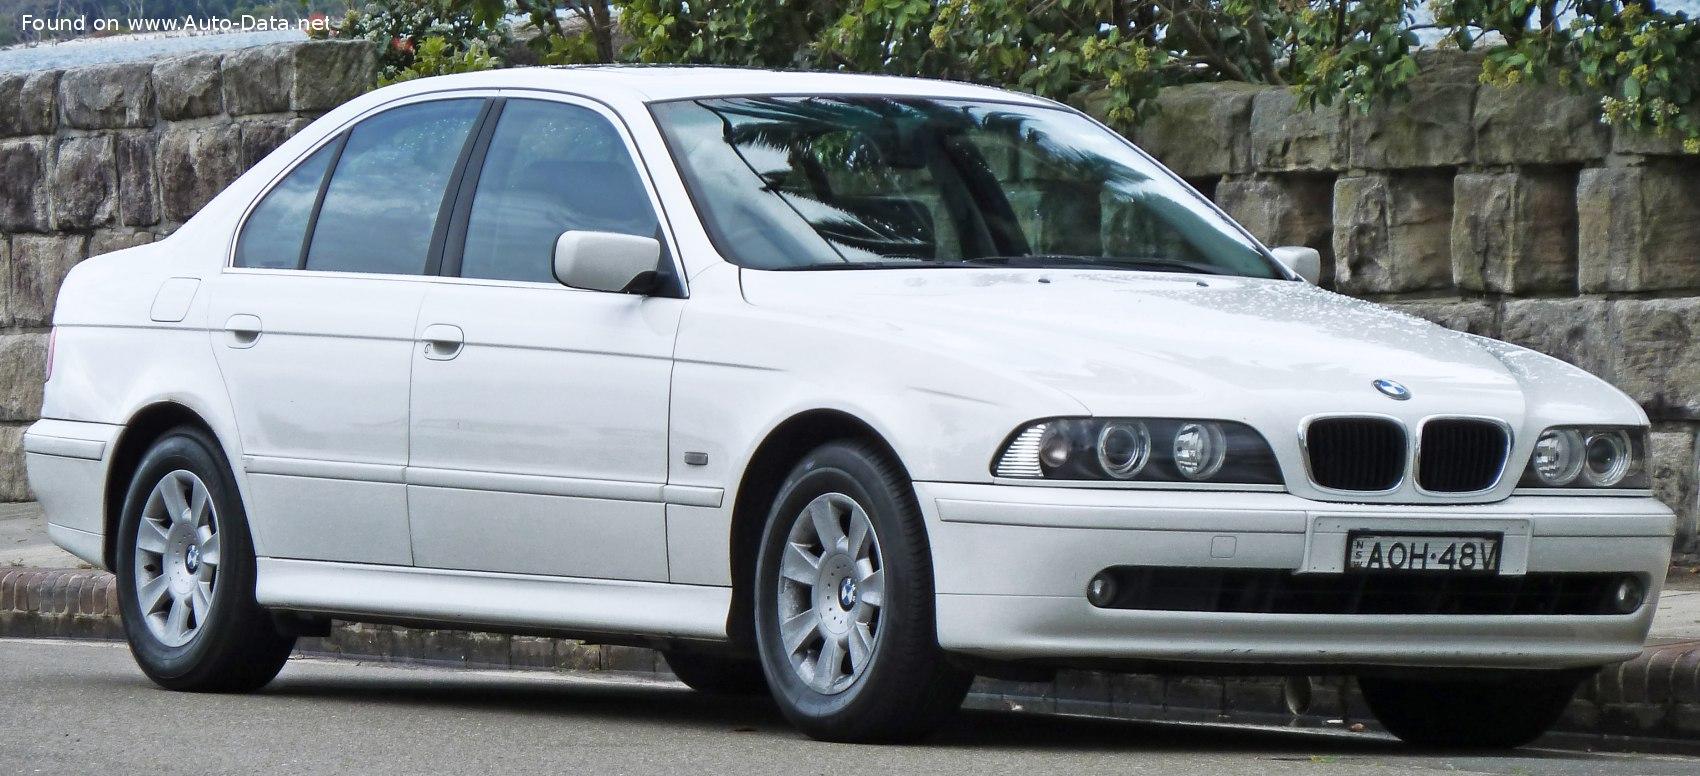 2000 Bmw 5 Series E39 Facelift 2000 525d 163 Hp Technical Specs Data Fuel Consumption Dimensions